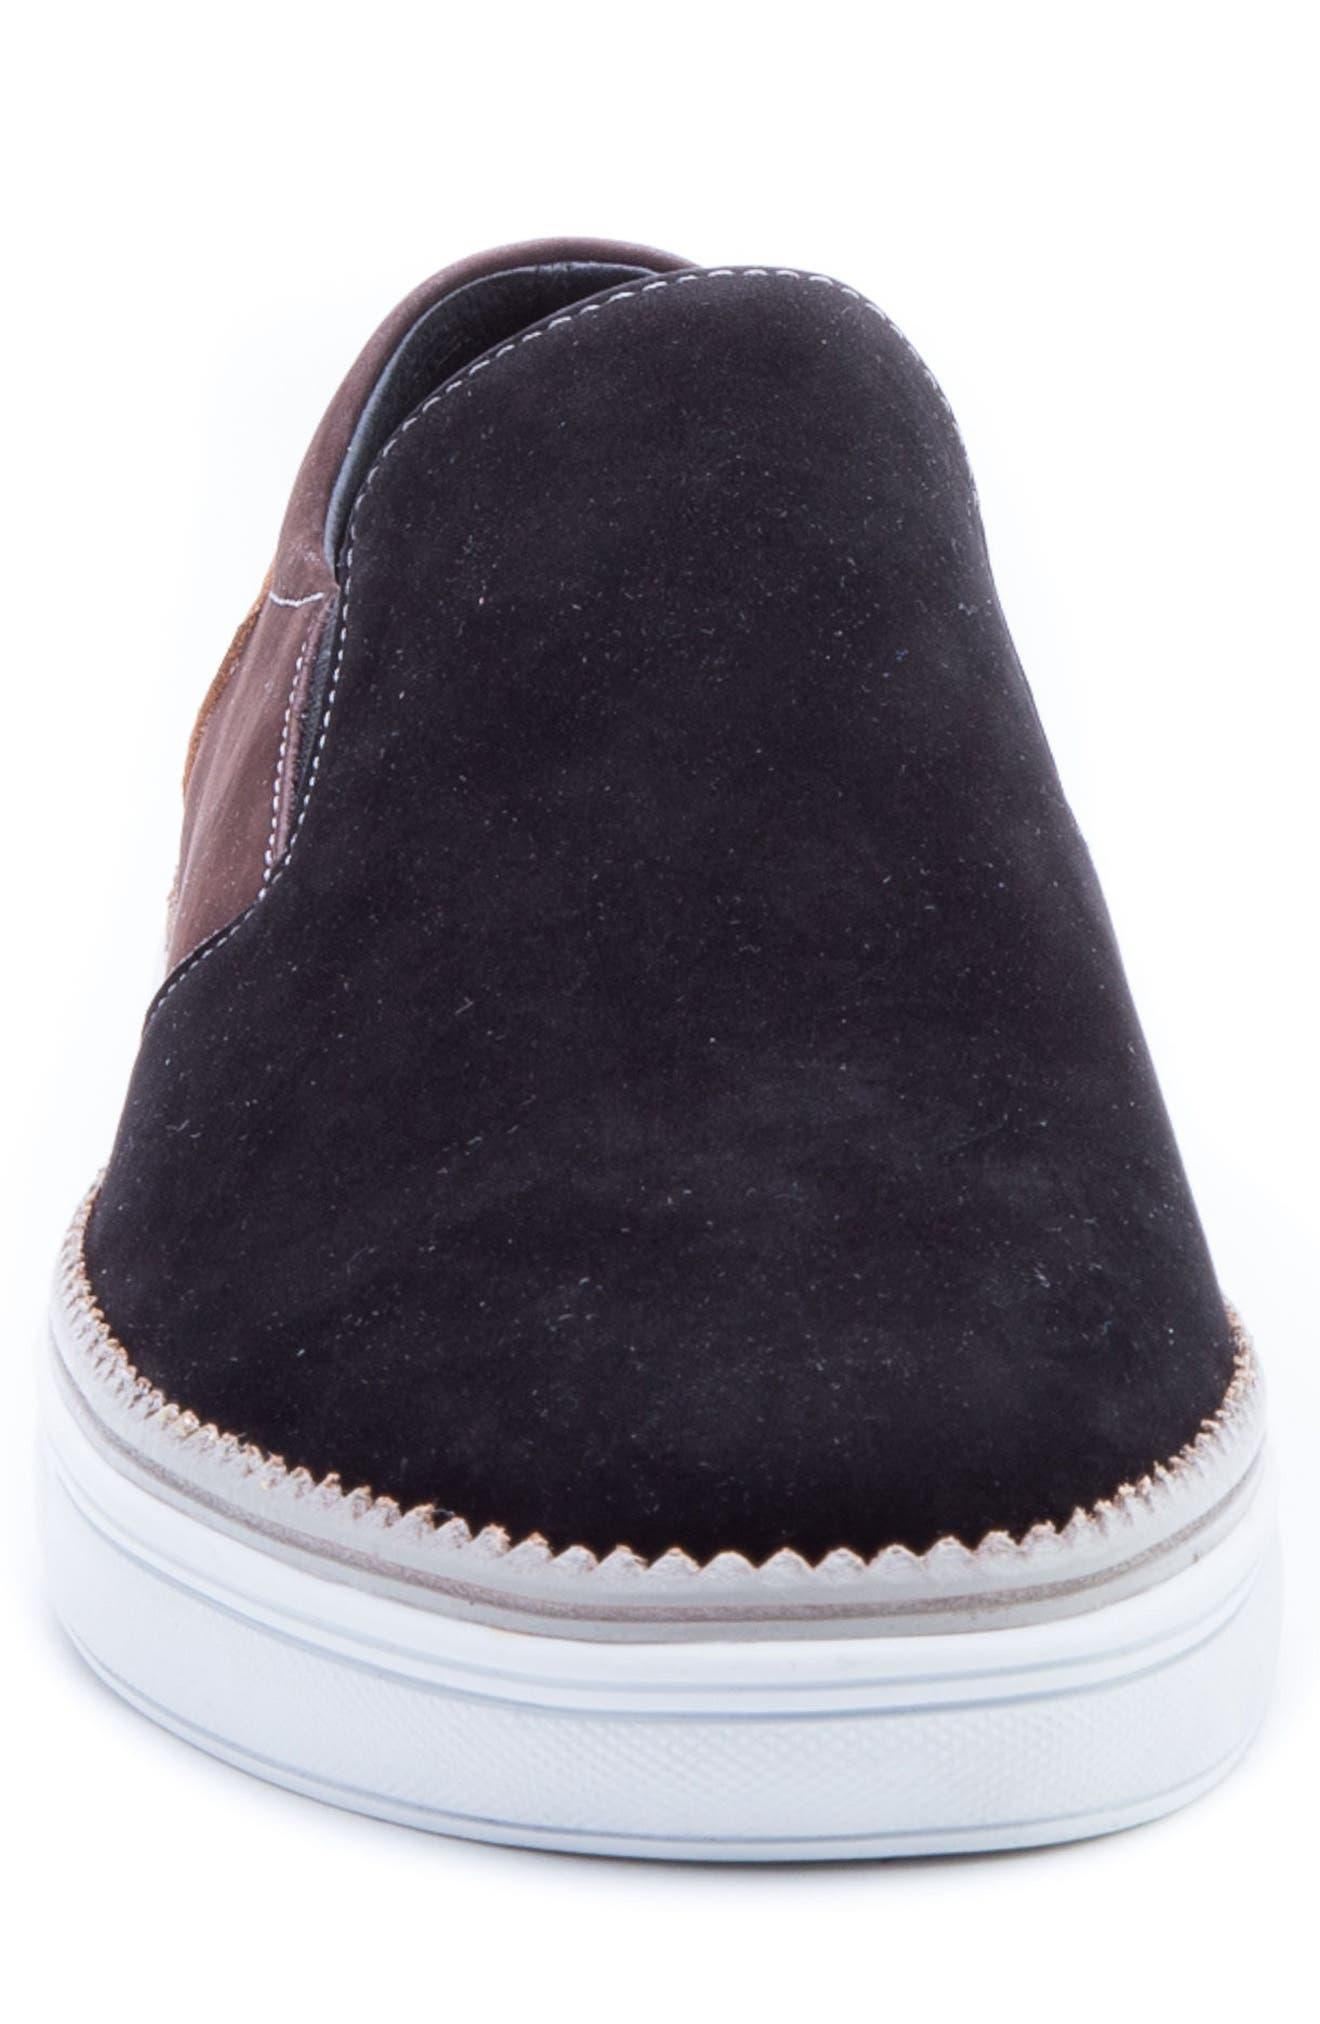 ZANZARA,                             Rivera Colorblocked Slip-On Sneaker,                             Alternate thumbnail 4, color,                             001